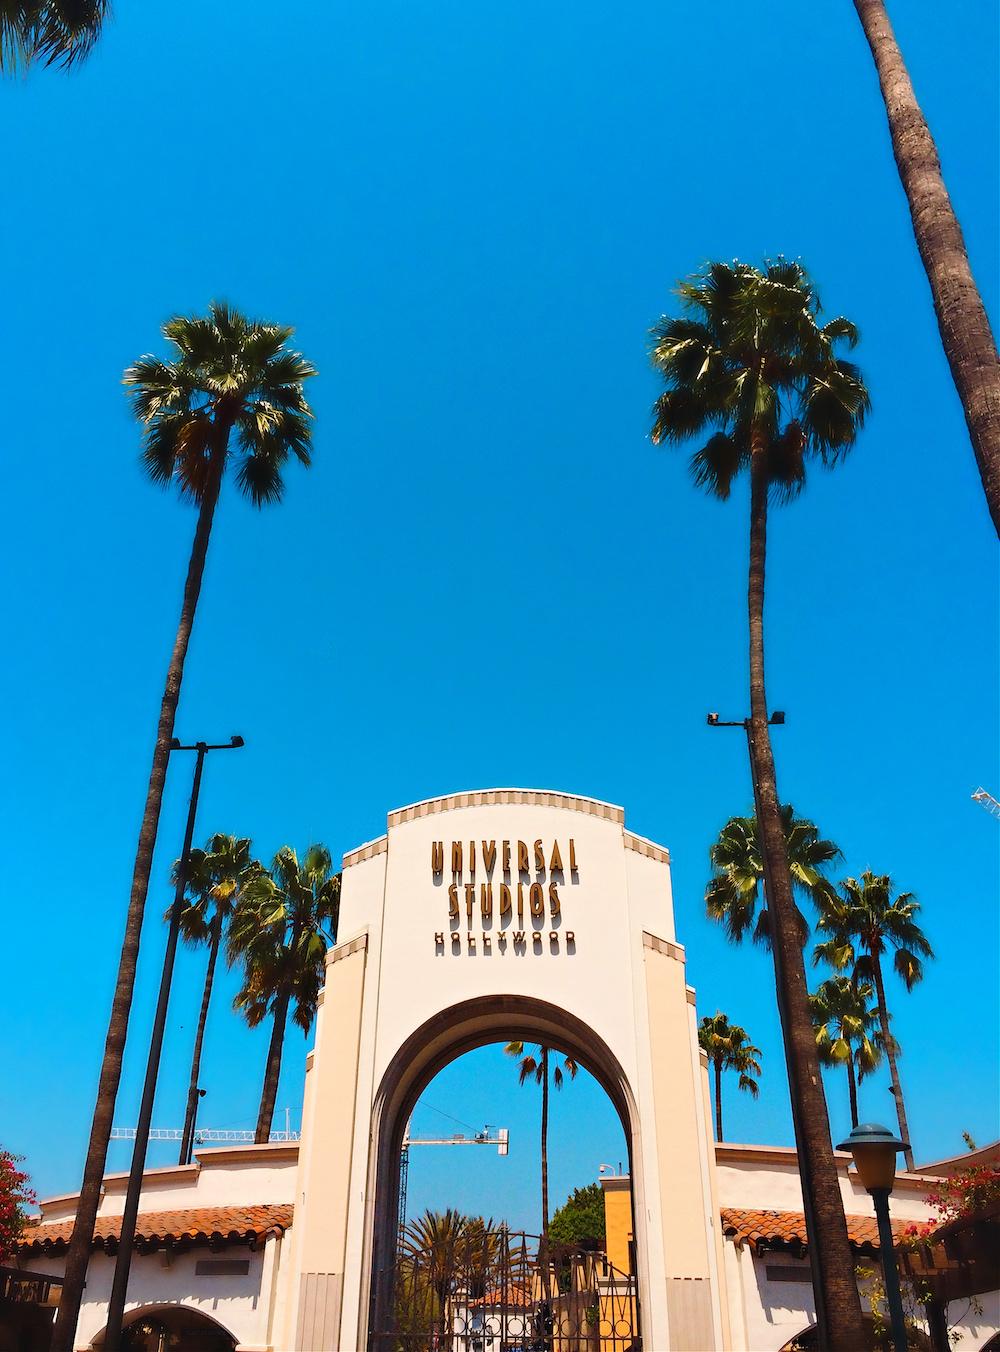 Universal Studios Hollywood Entrance